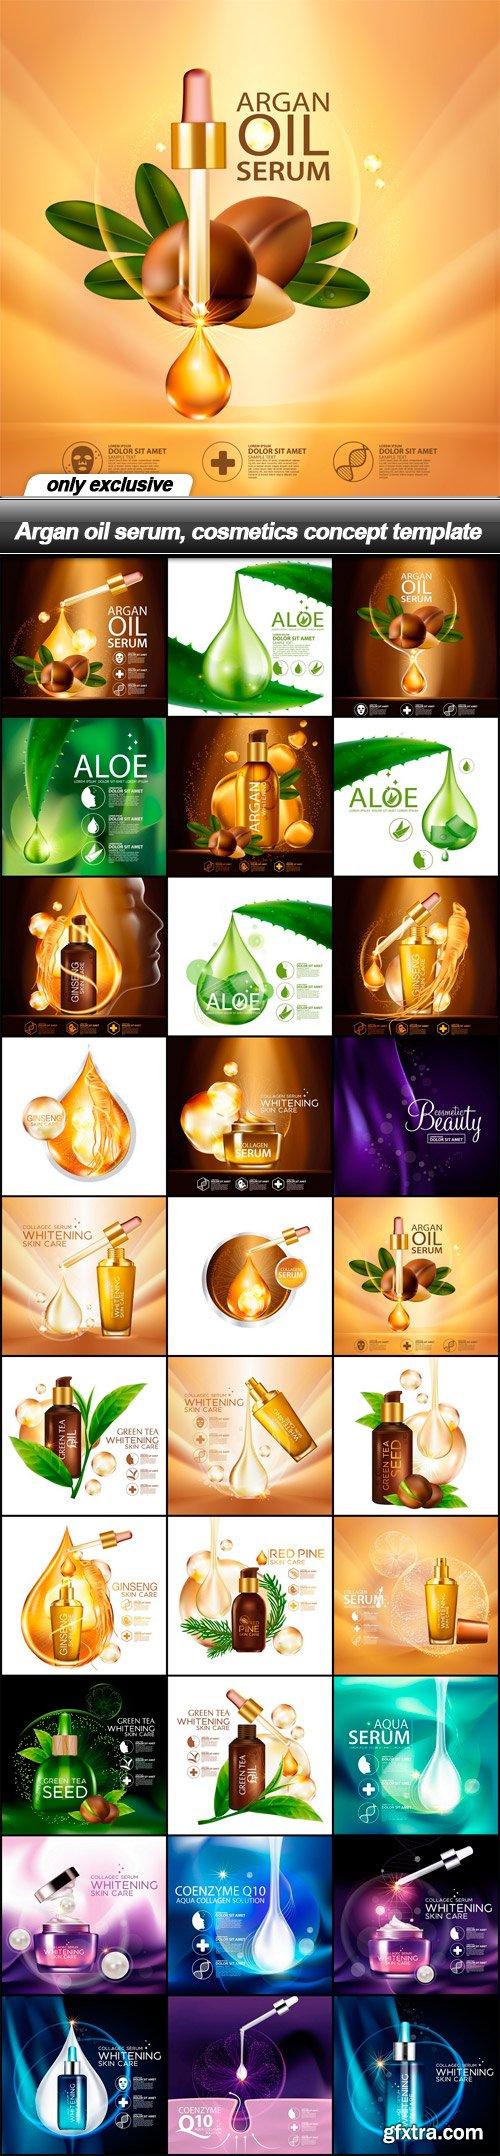 Argan oil serum, cosmetics concept template - 30 EPS